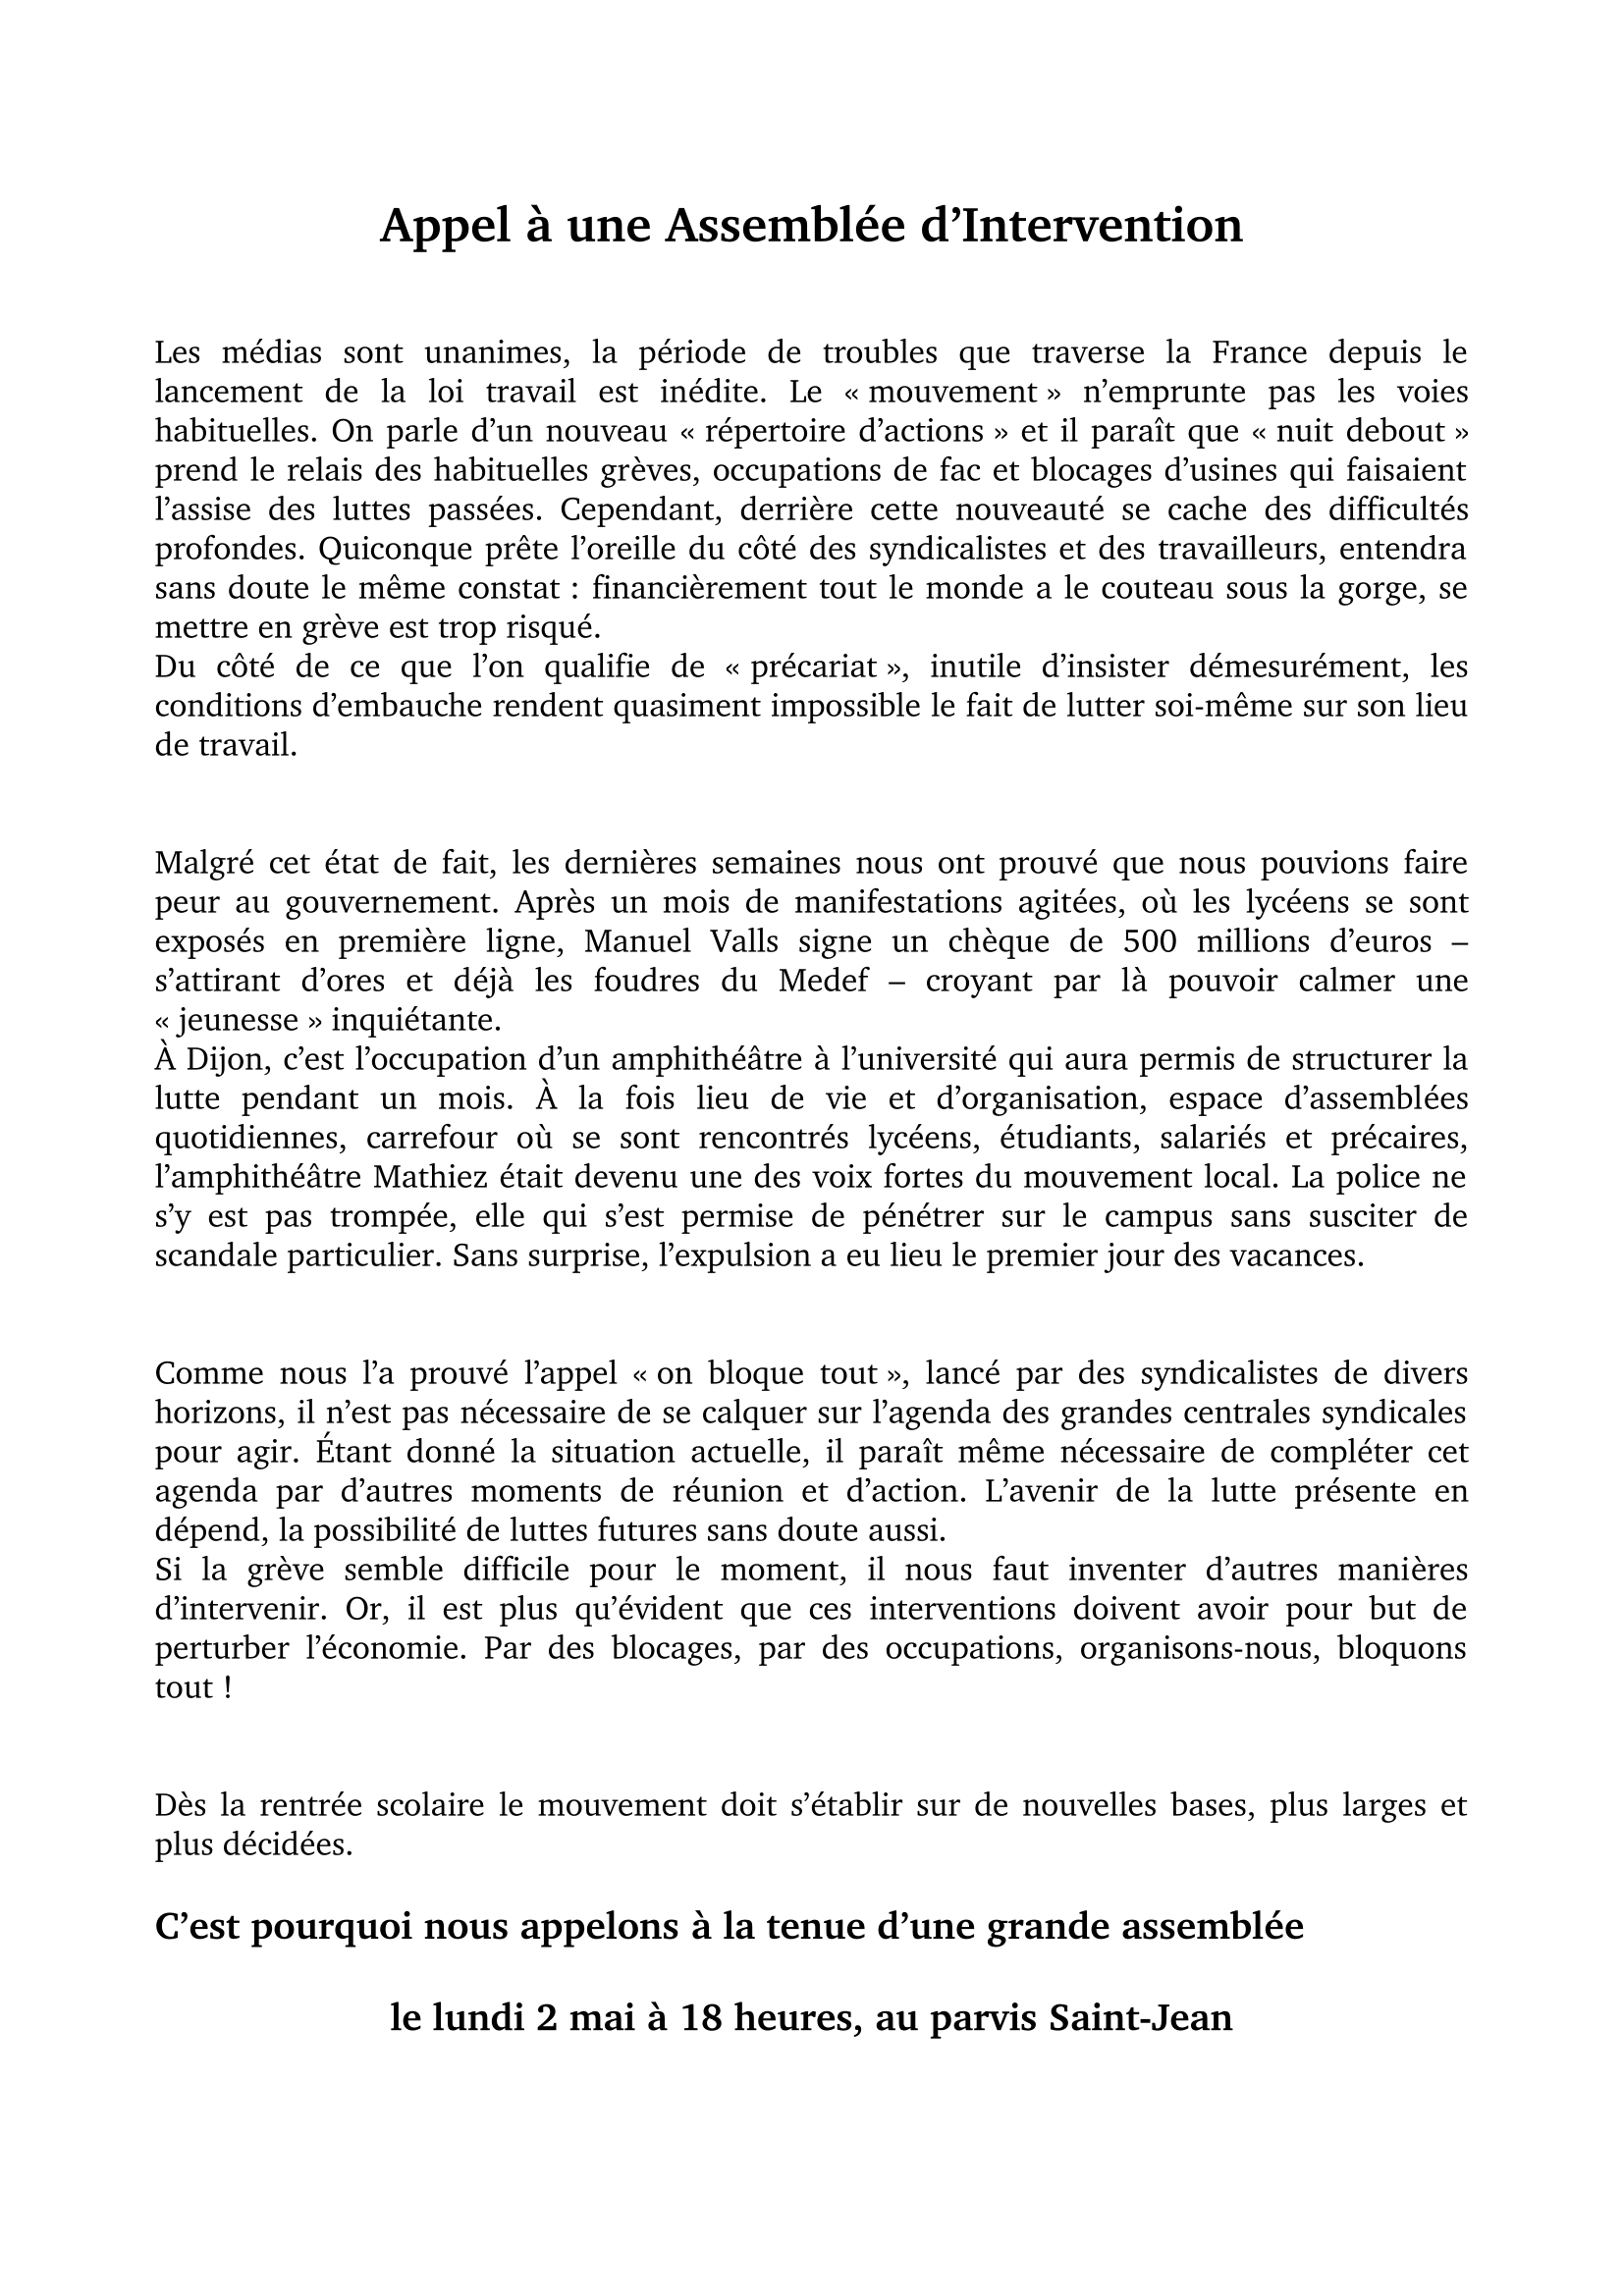 appel-assemblée-d-intervention-1